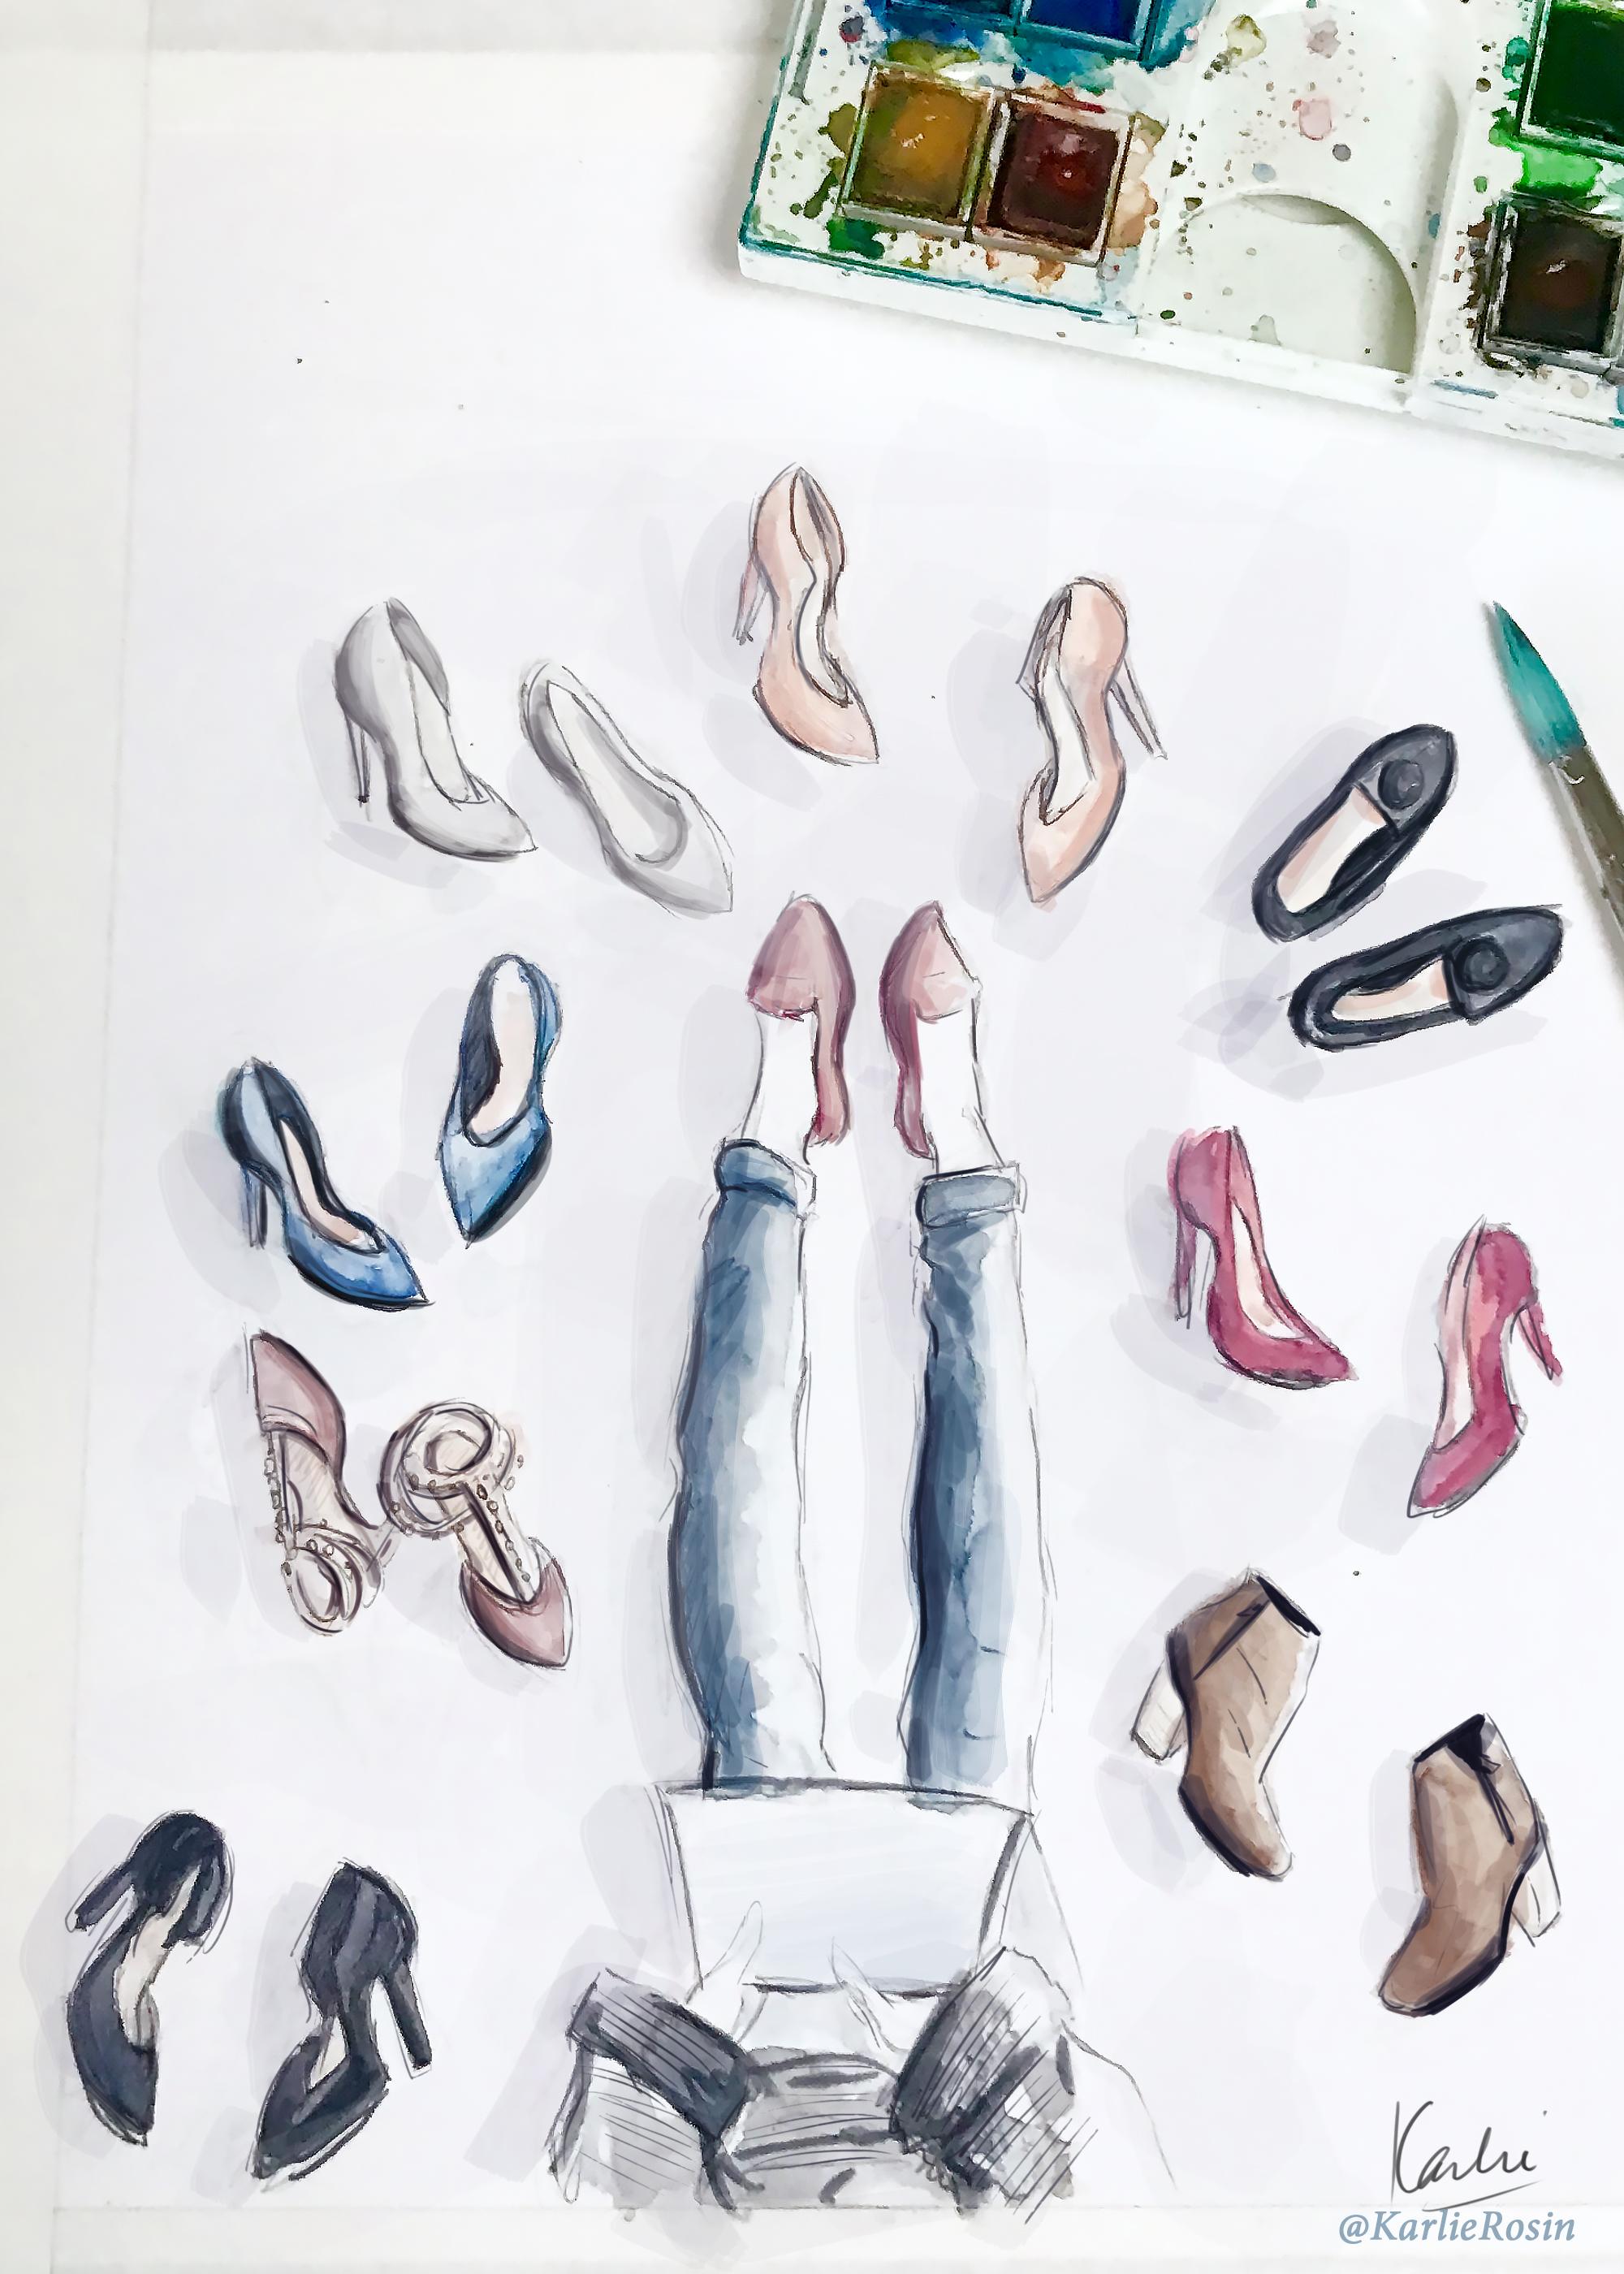 Fashion illustration: watercolour, acrylic paint and digital finish